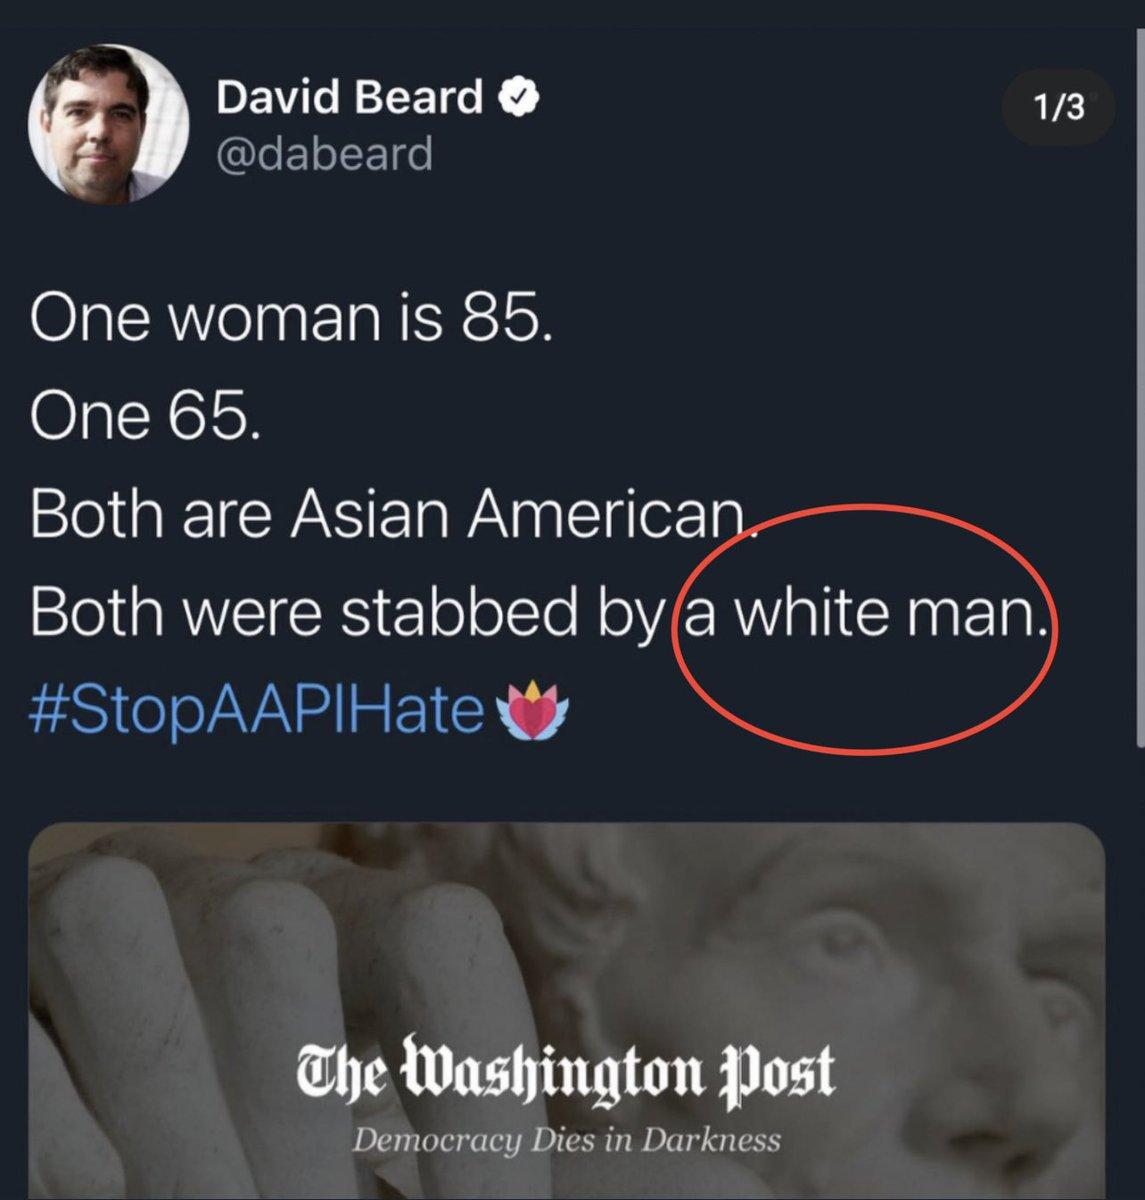 Wow. Wonder what the update was? https://t.co/9H5cpDwPHh